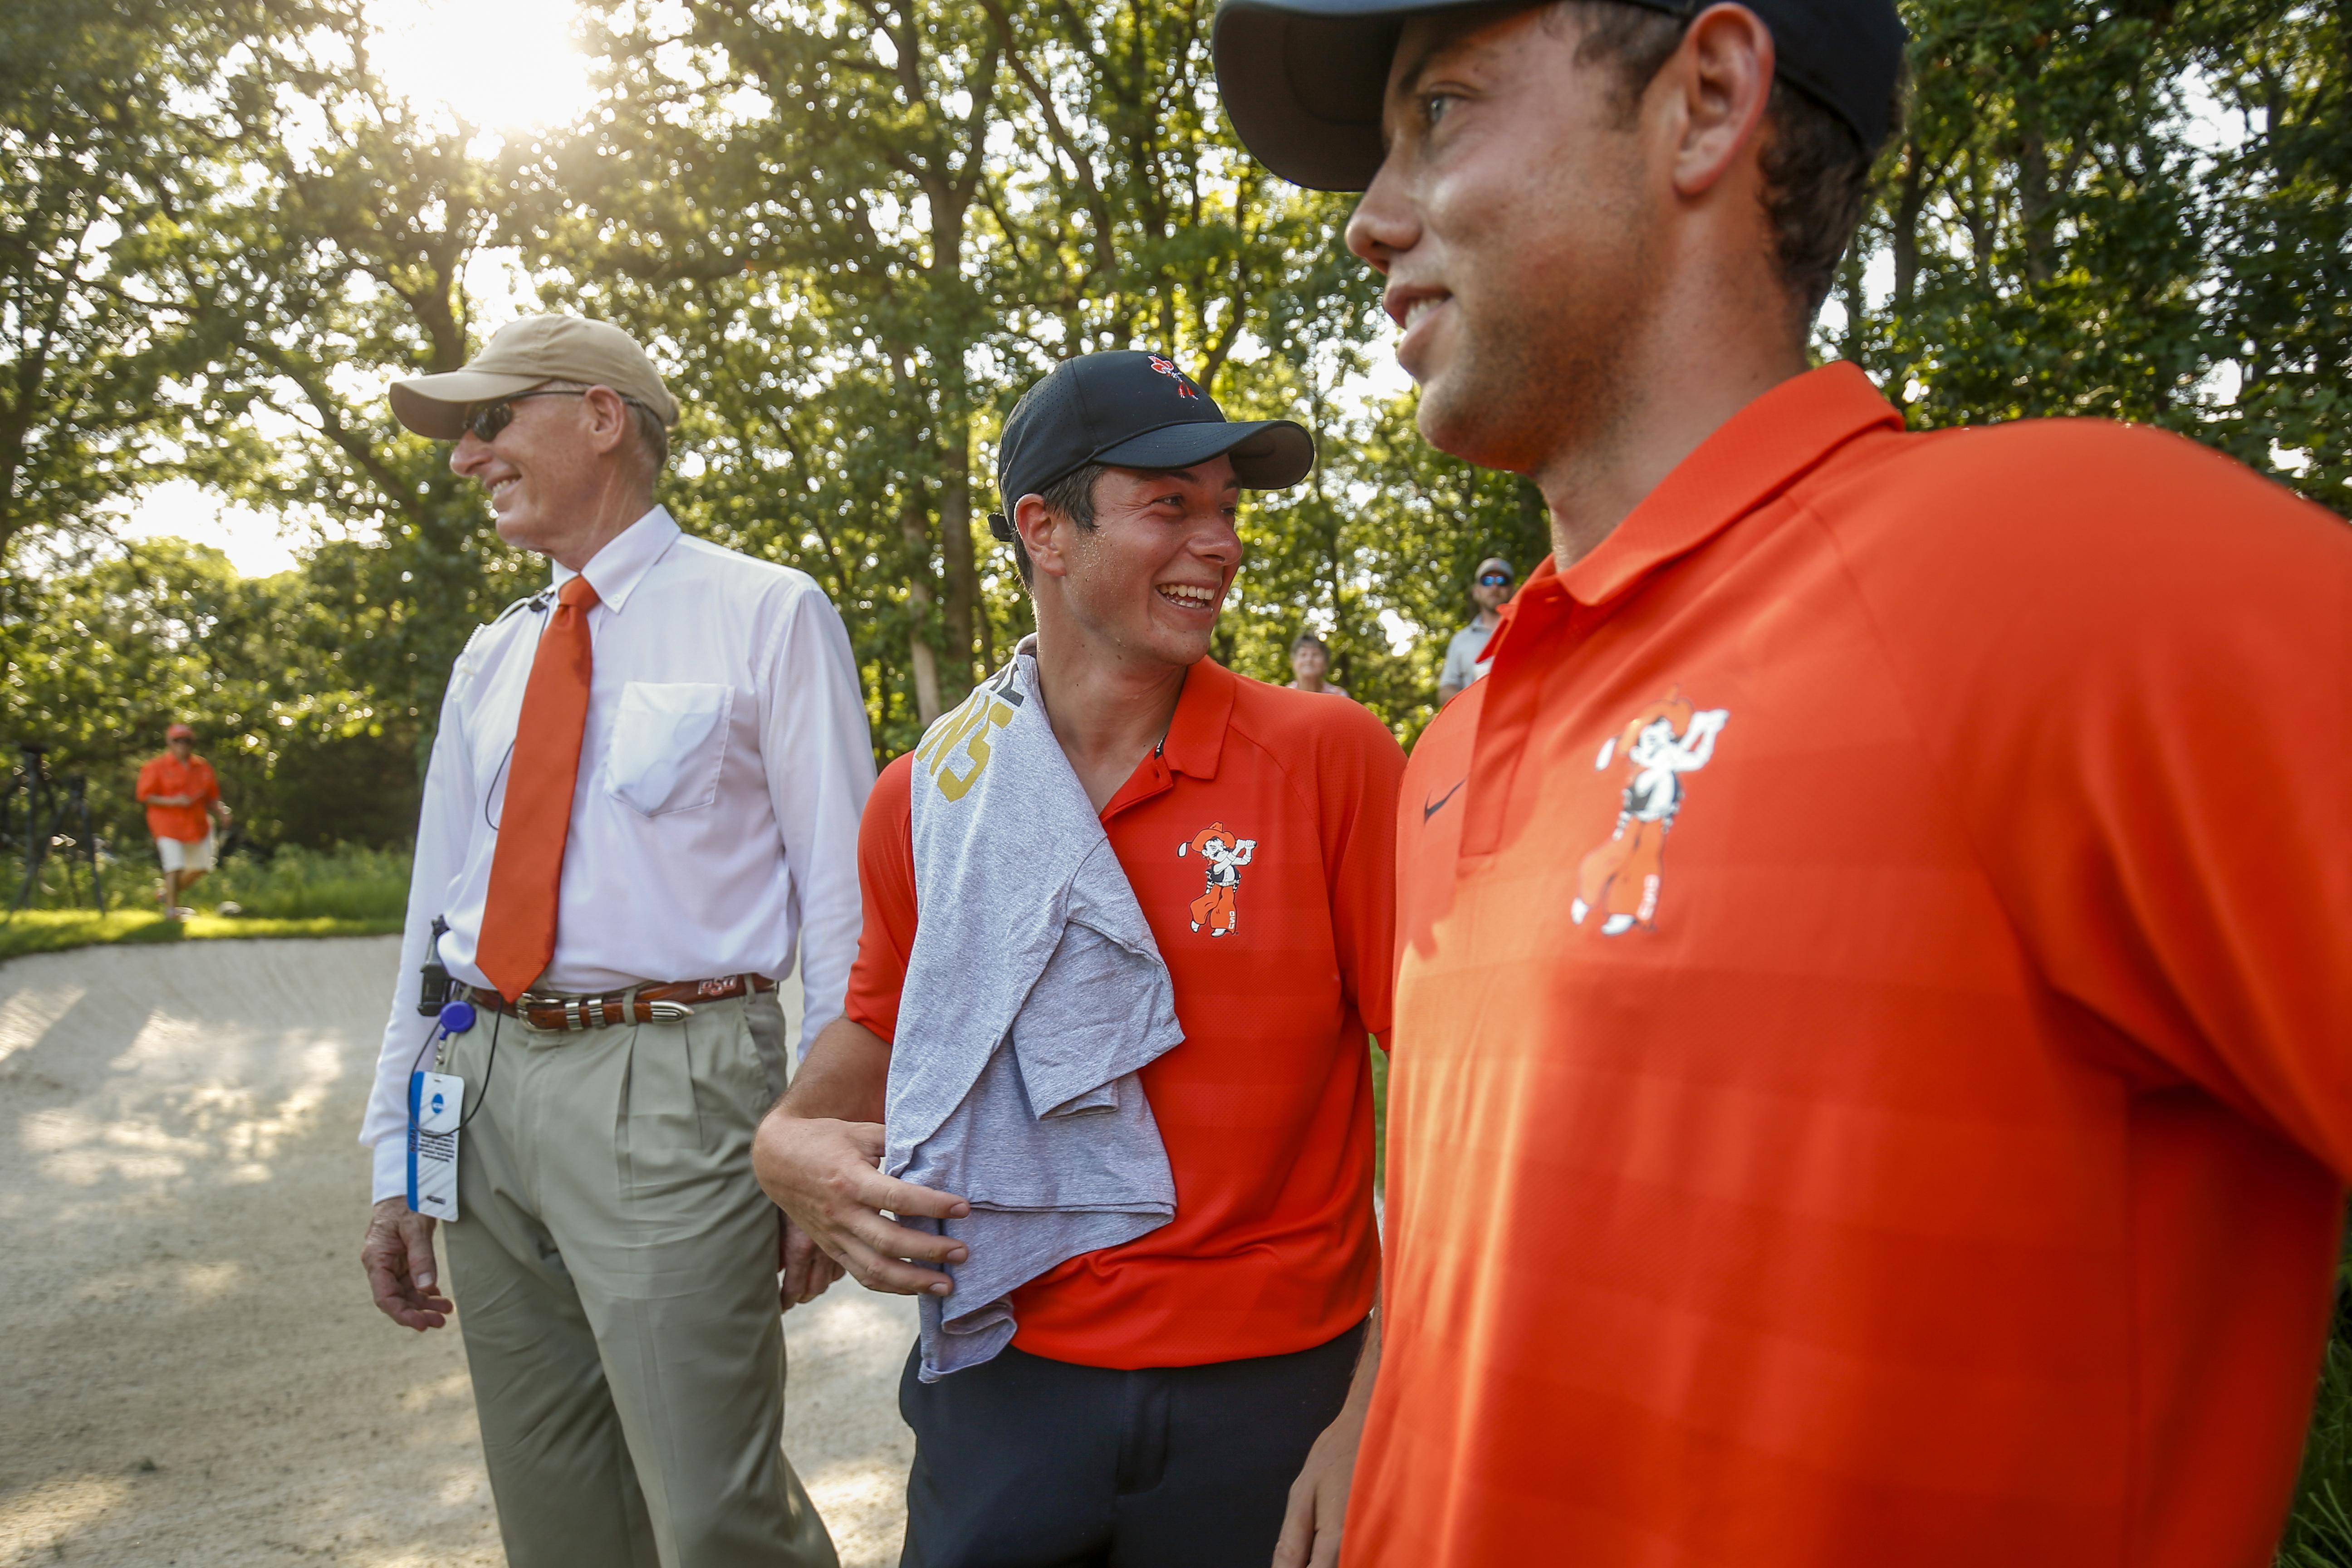 2018 NCAA Division I Men's Golf Championship - Match Play